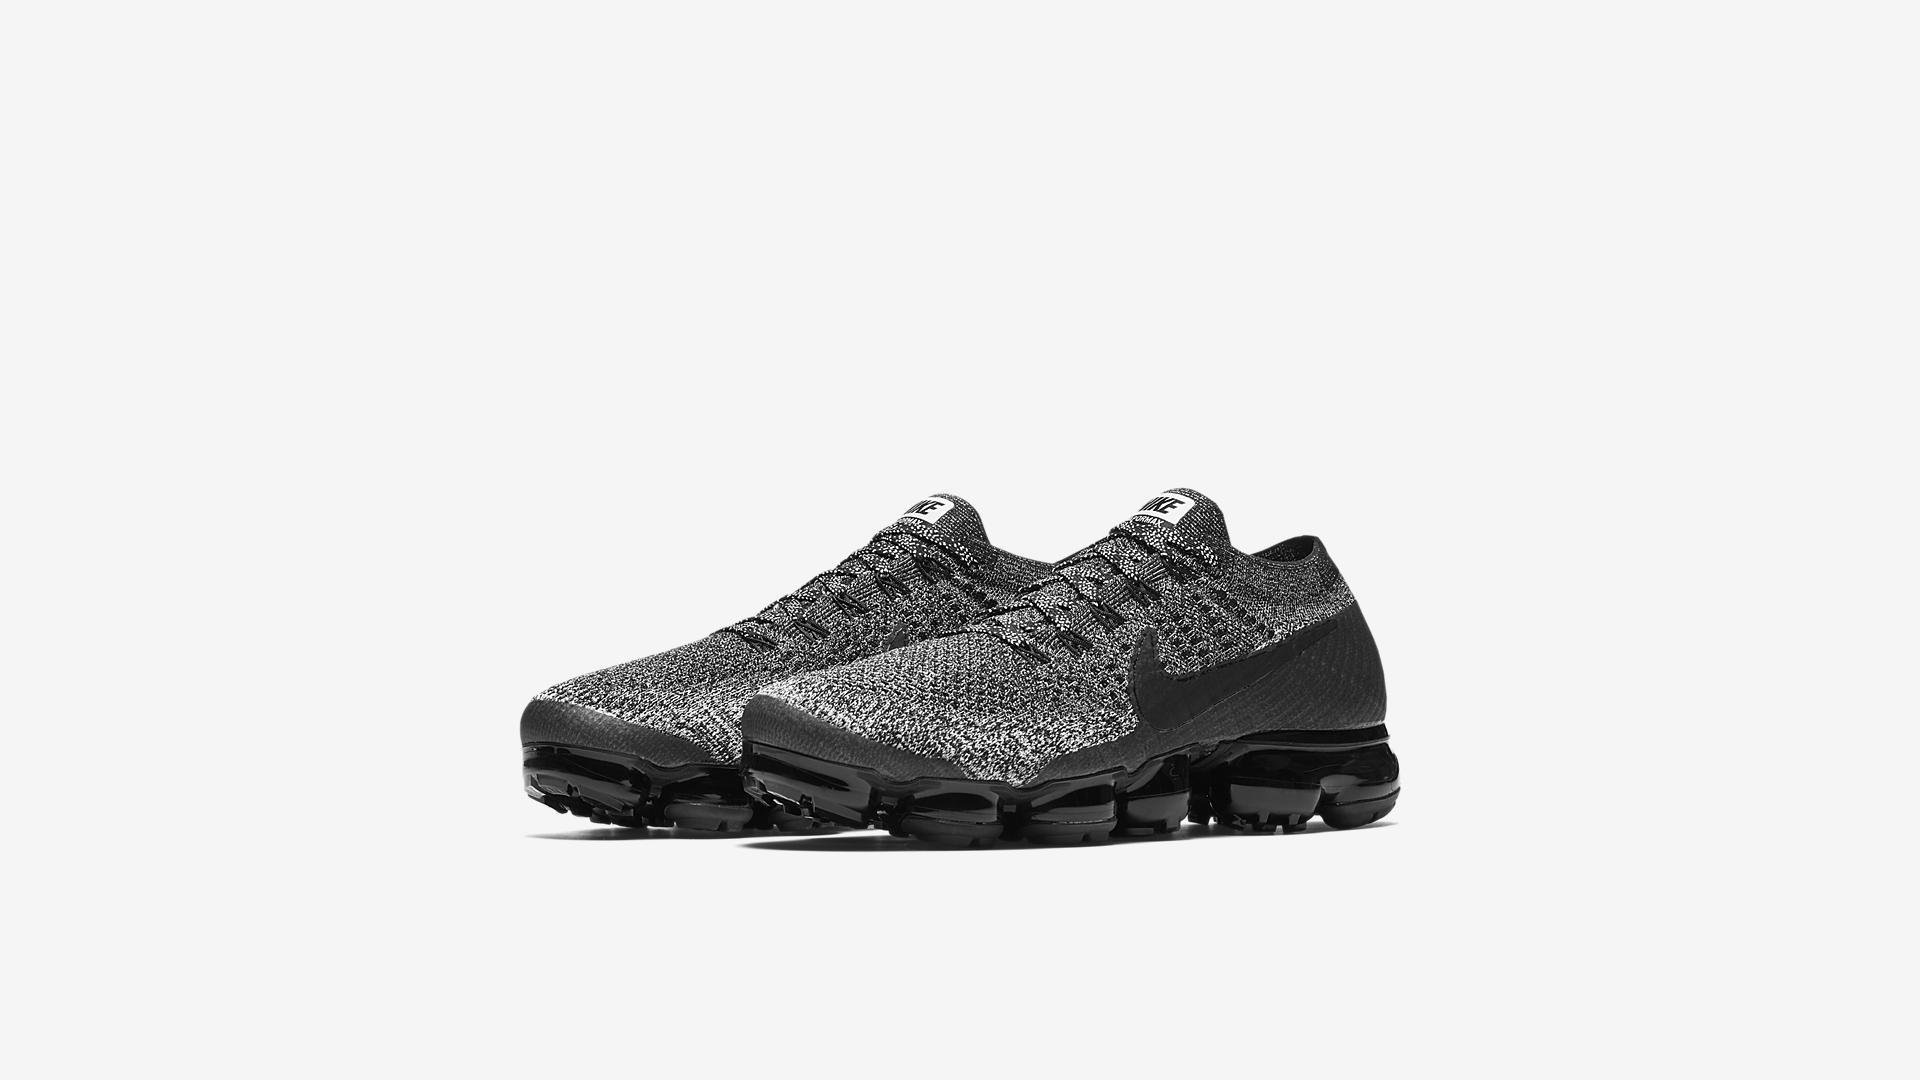 849558 041 Nike Air VaporMax Oreo 1